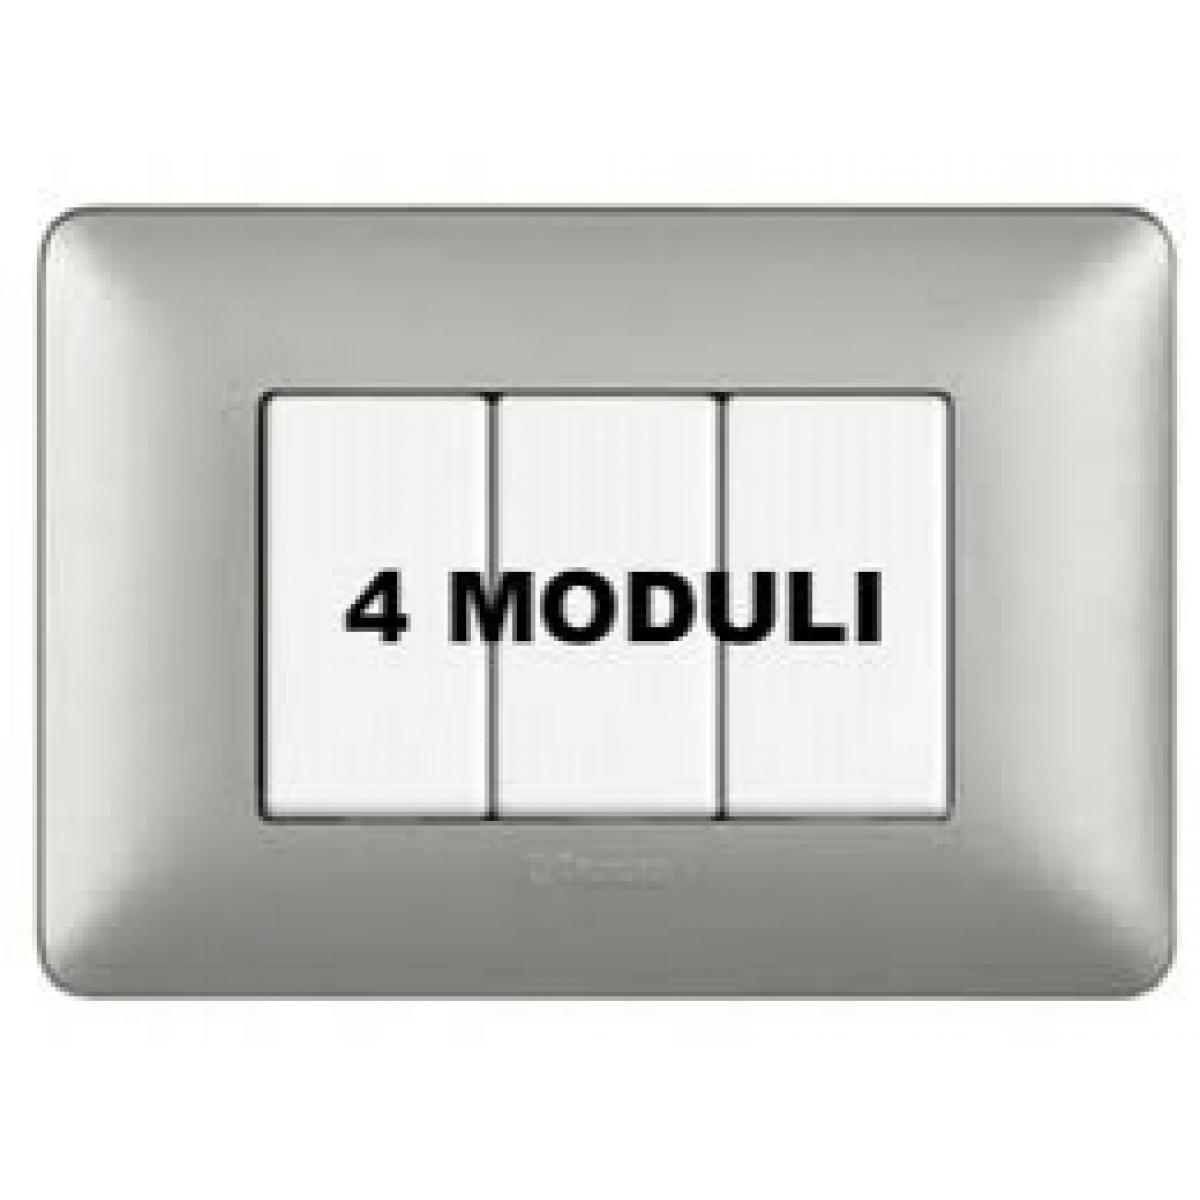 Placca 4 Moduli Silver Bticino Matix AM4804MSL